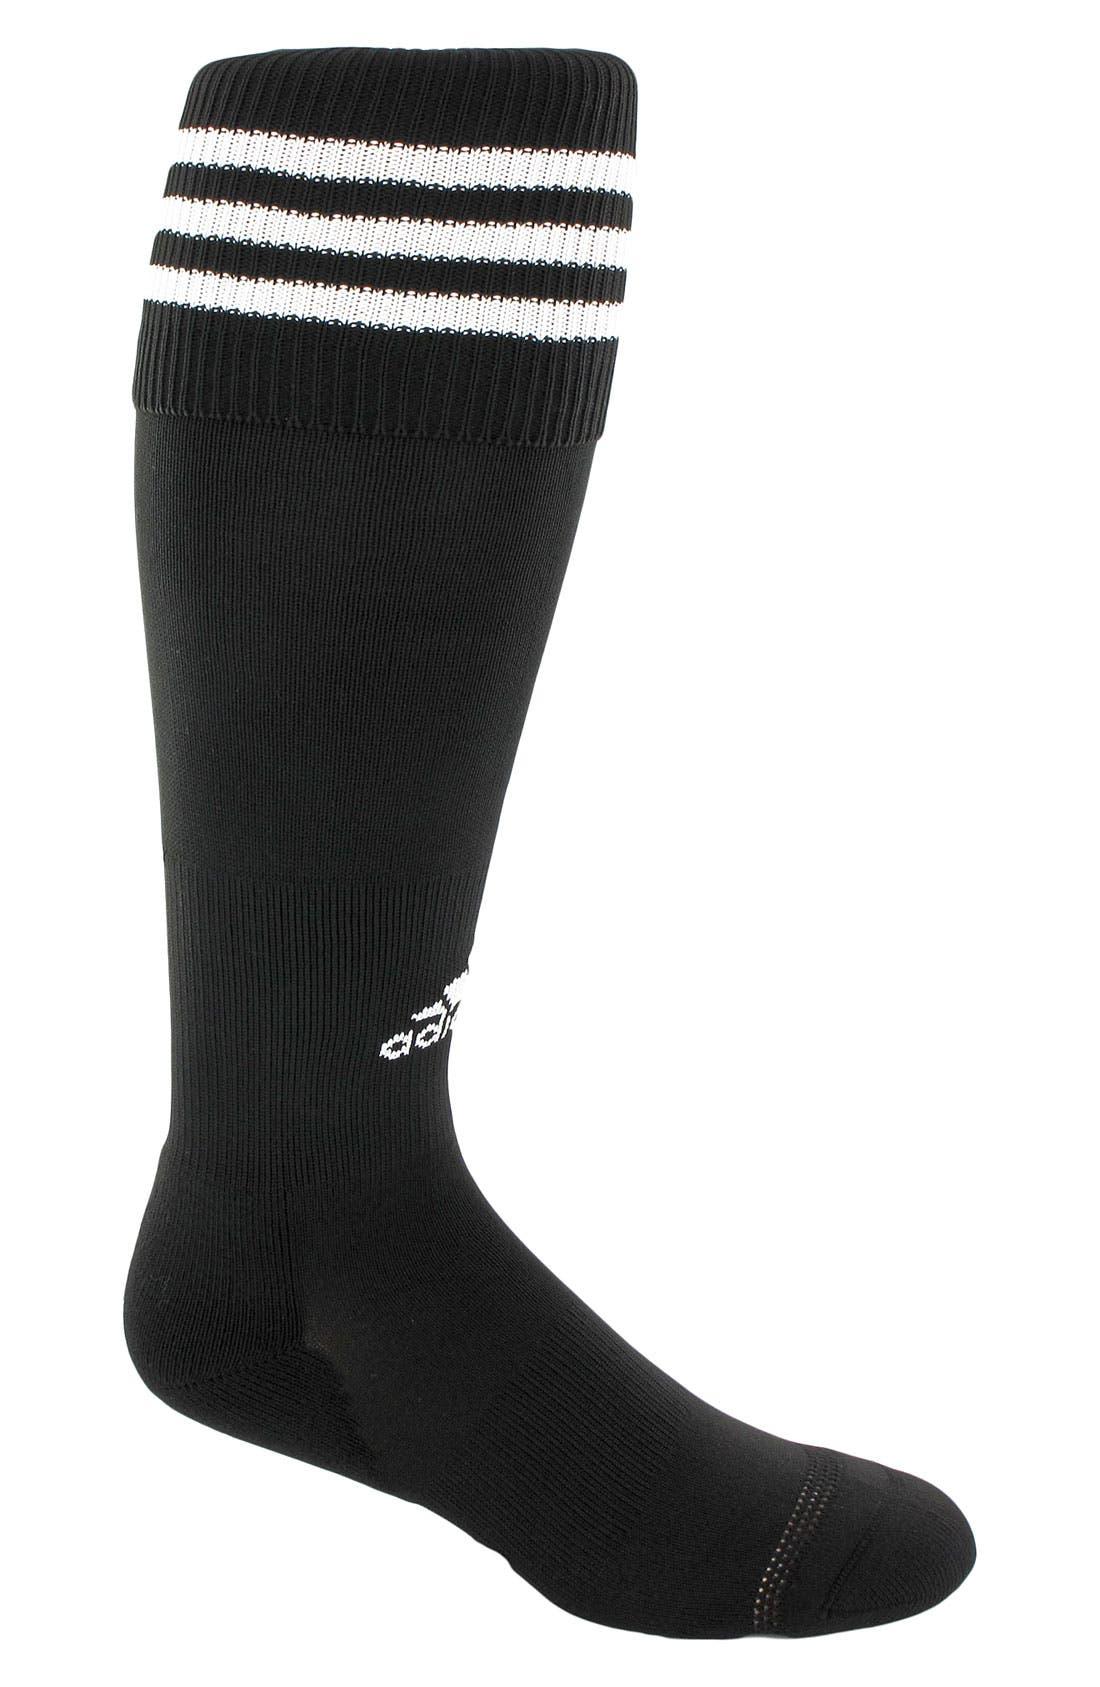 Main Image - adidas 'Copa Zone' Soccer Socks (Little Boys & Big Boys)